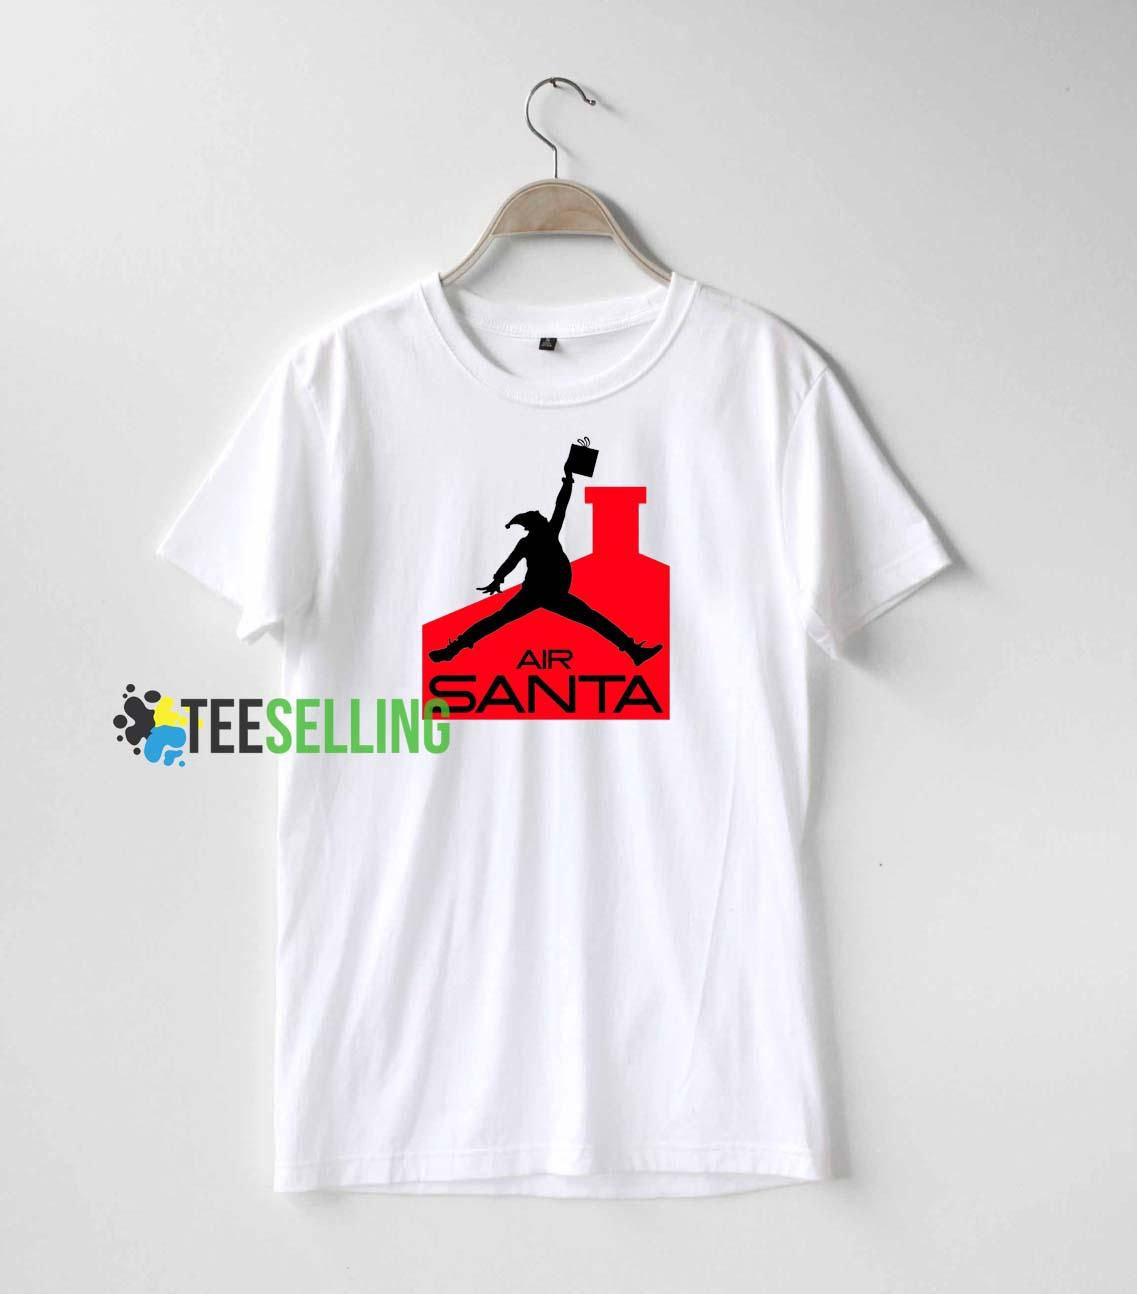 f3d6ca26b86859 Air santa T shirt Adult Unisex For men and women Size S-3XL